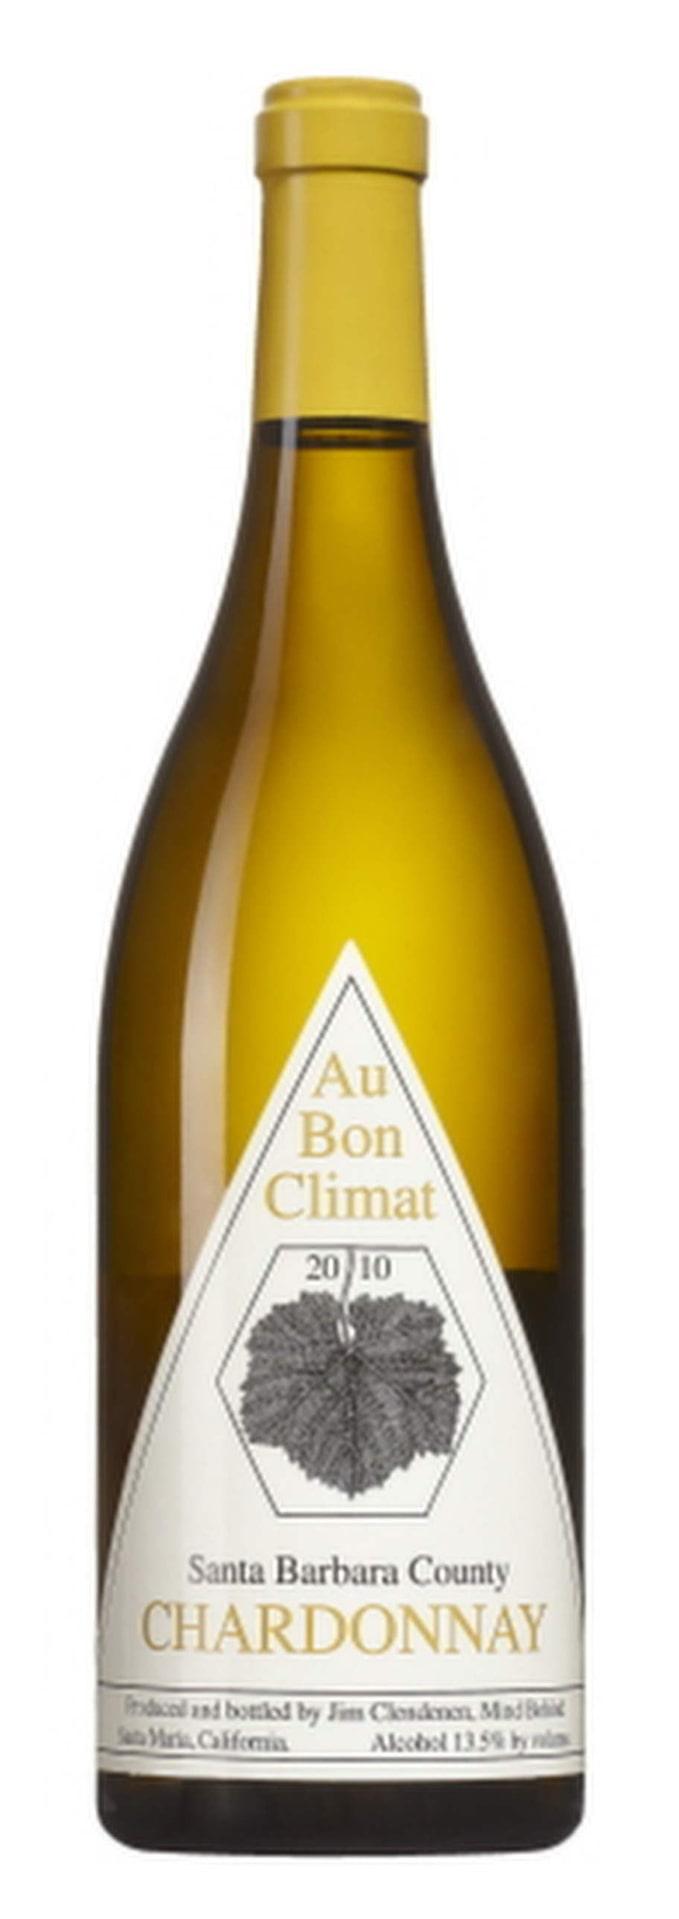 Au Bon Climat Chardonnay 2010 (90116) USA, 199 kr